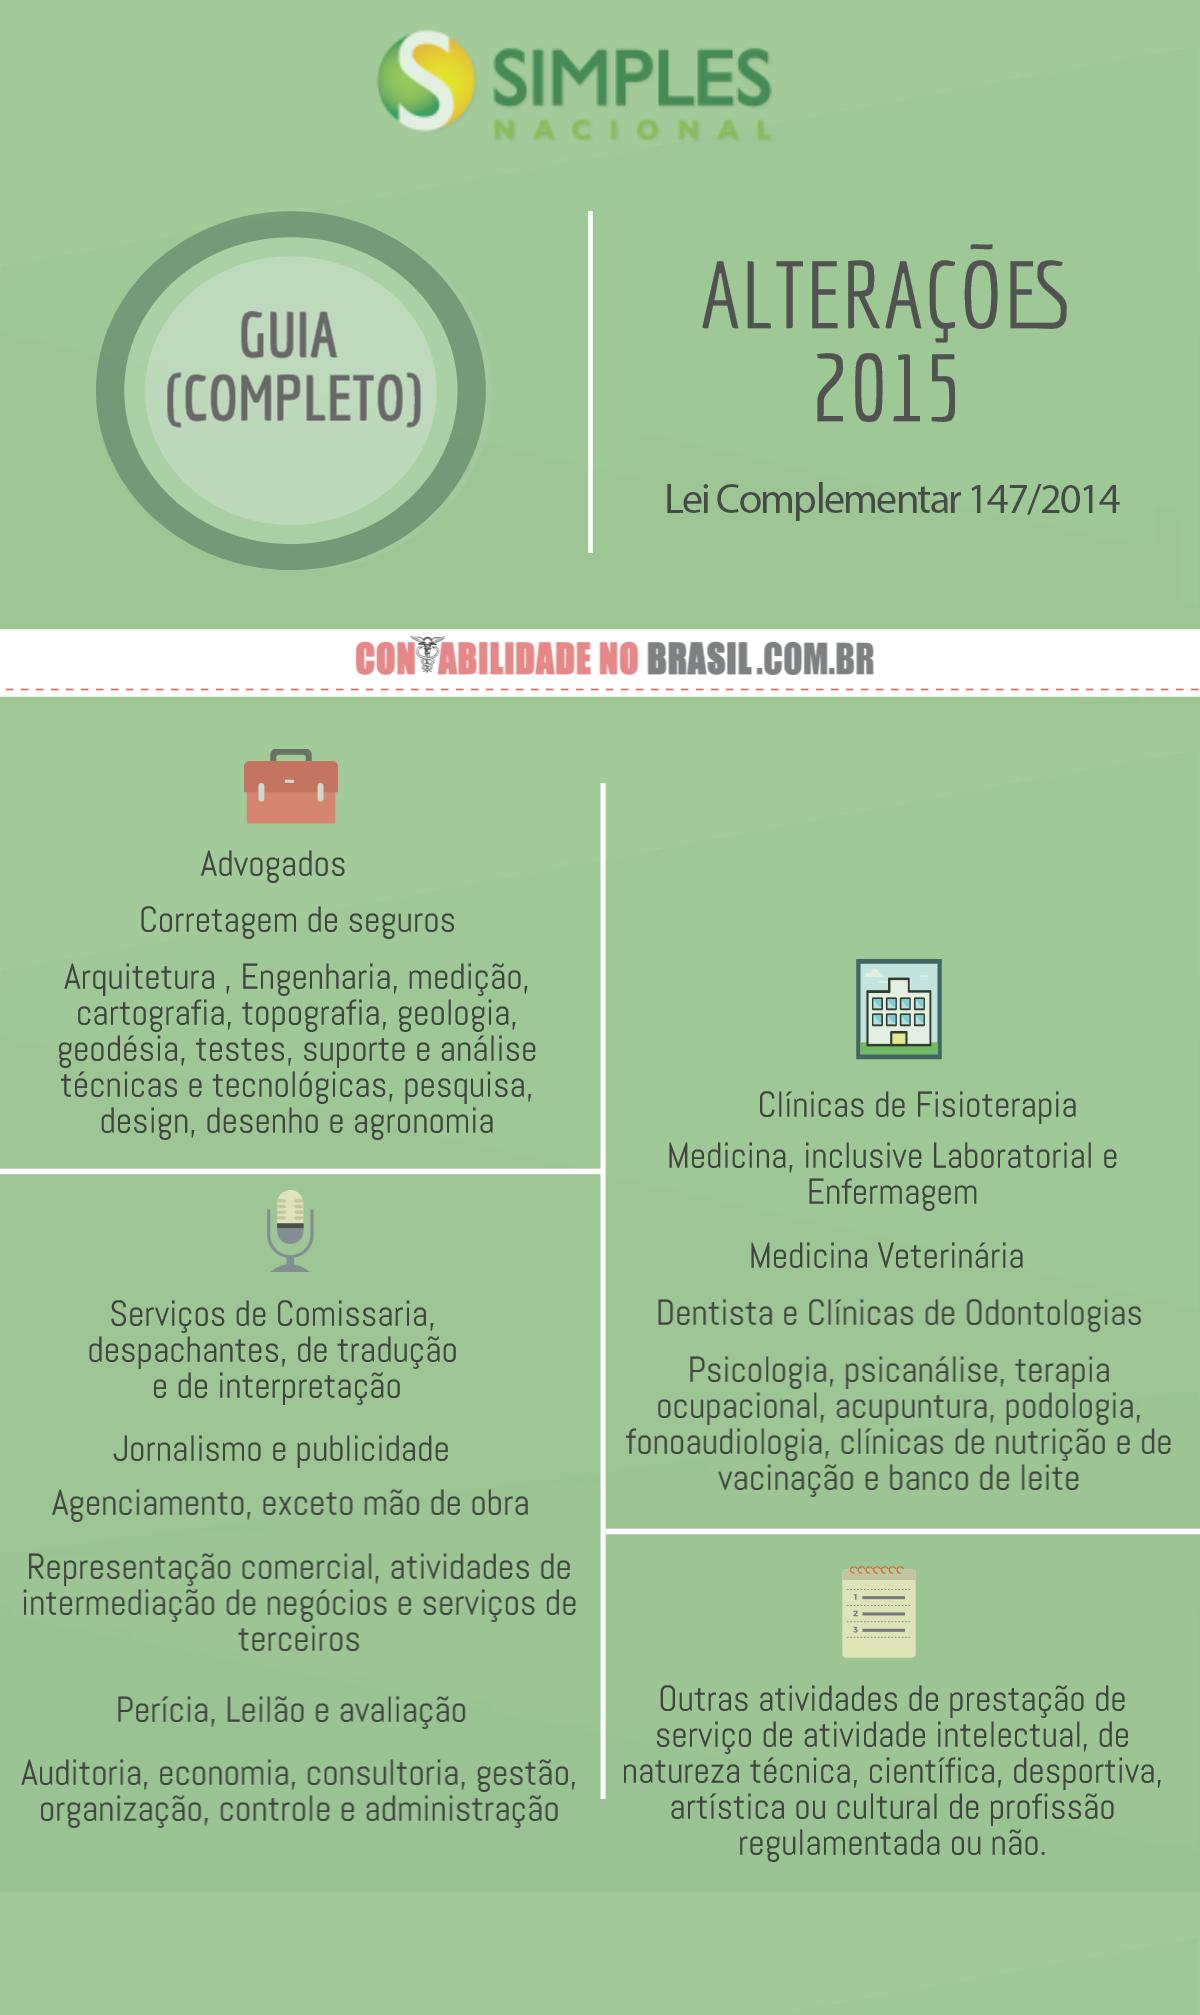 Simples Nacional - Lei Complementar 147 de 2014